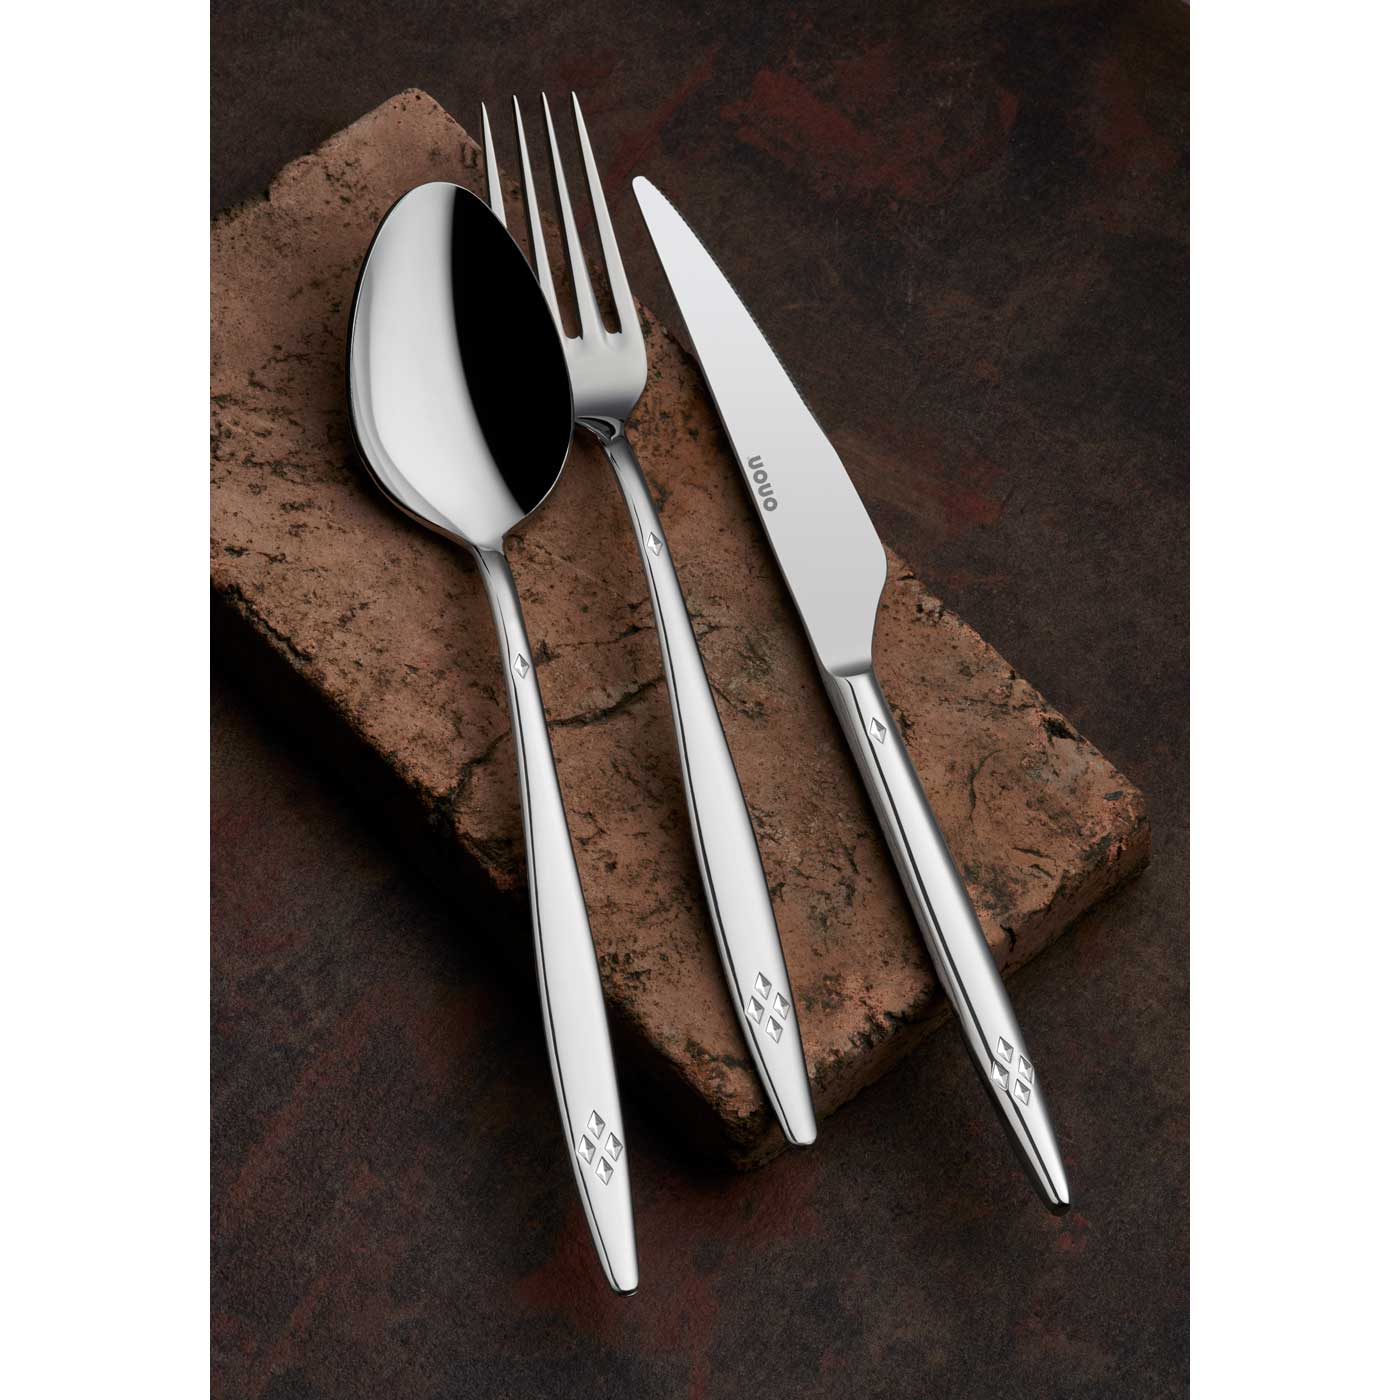 ONON Mira Sade 12 Adet Yemek Çatalı 2